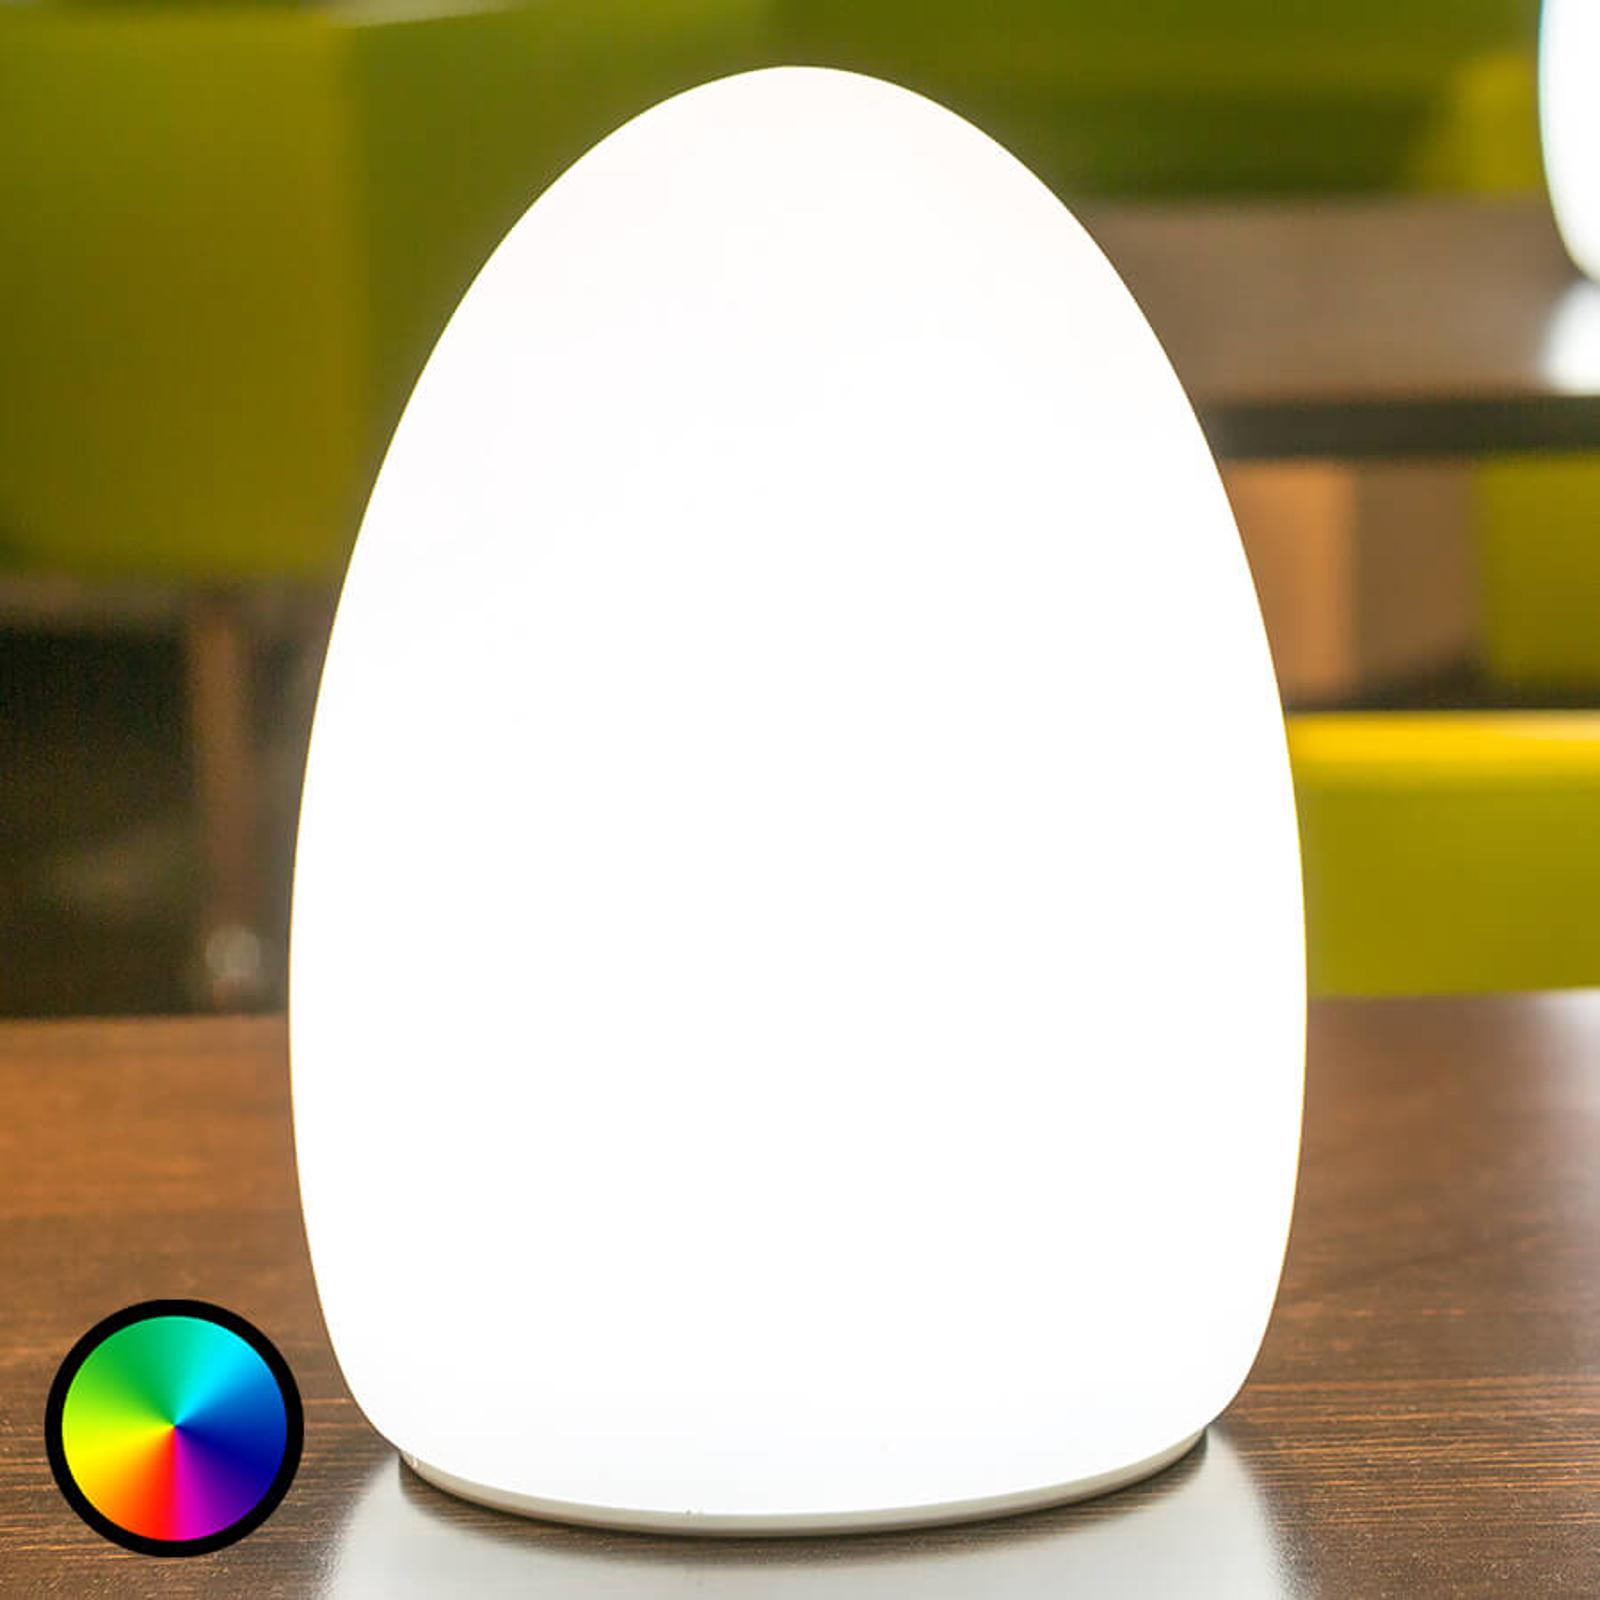 Egg - dekorationslampe med batteri, styres via app